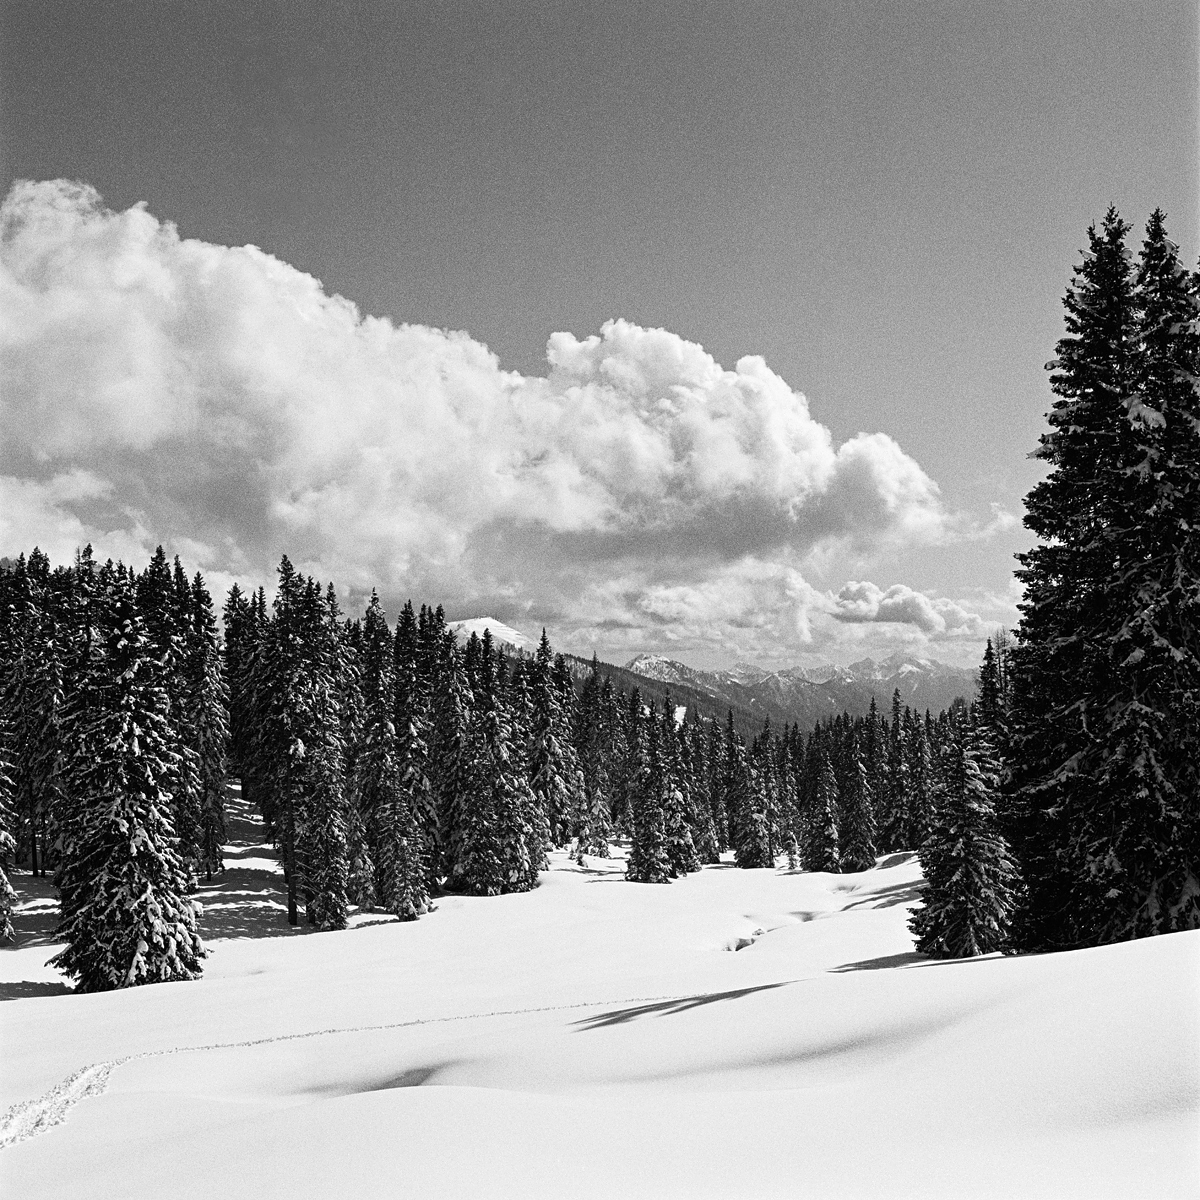 025 | Hasselblad 501C | ©AlbertoBregani